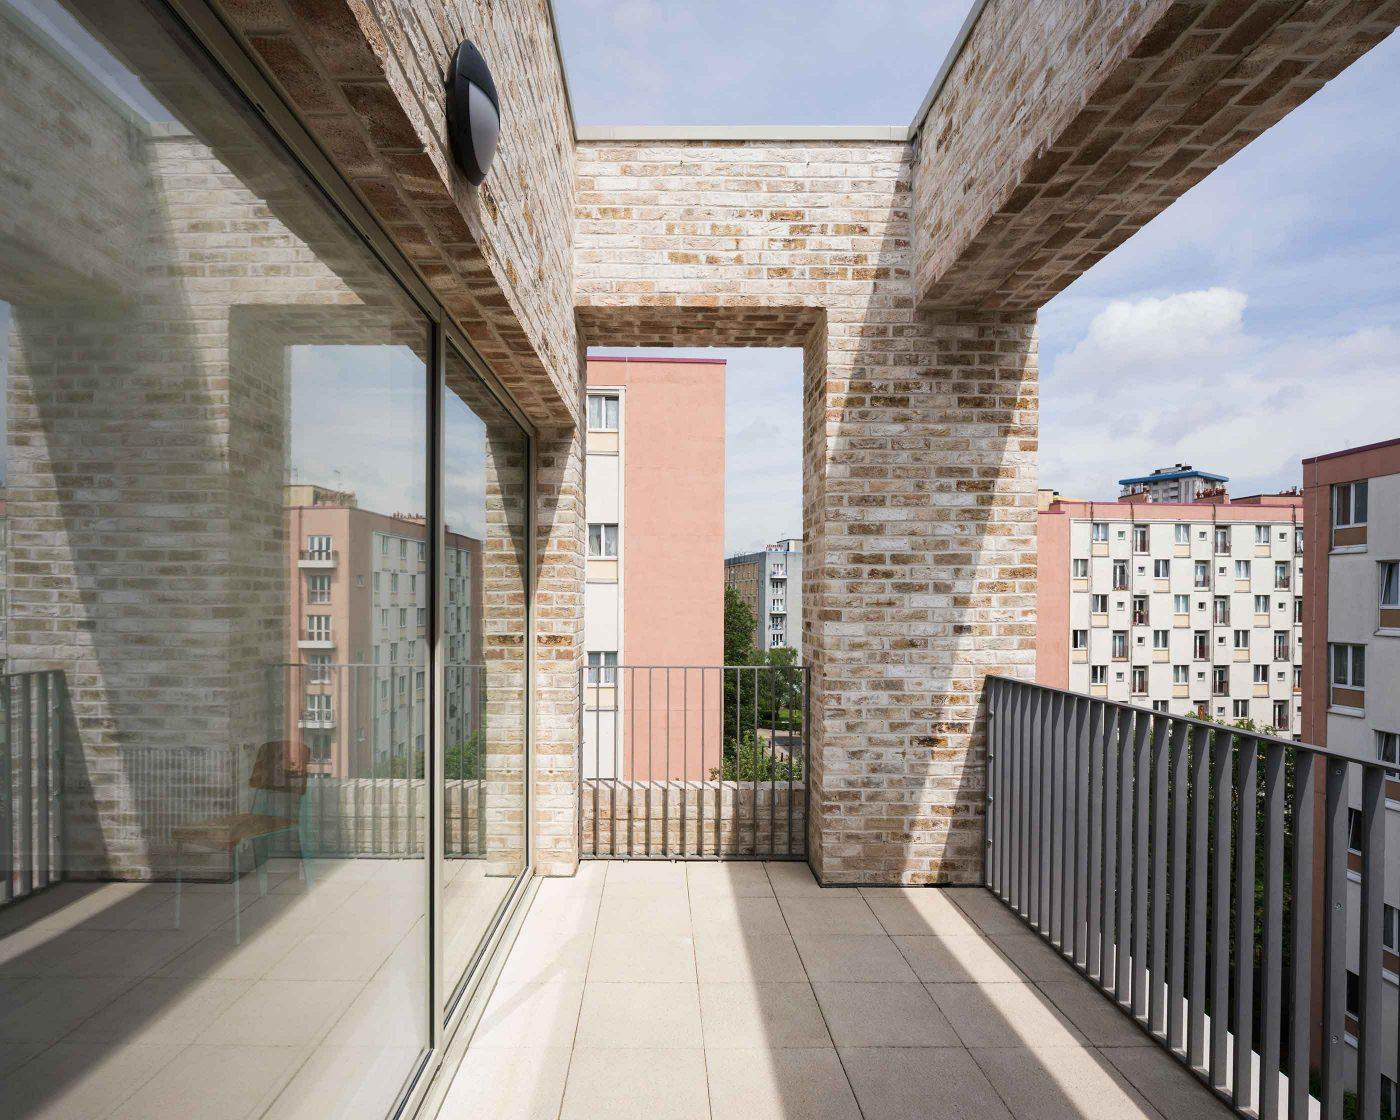 20180808 Mae Architects Varndell Street 11 A